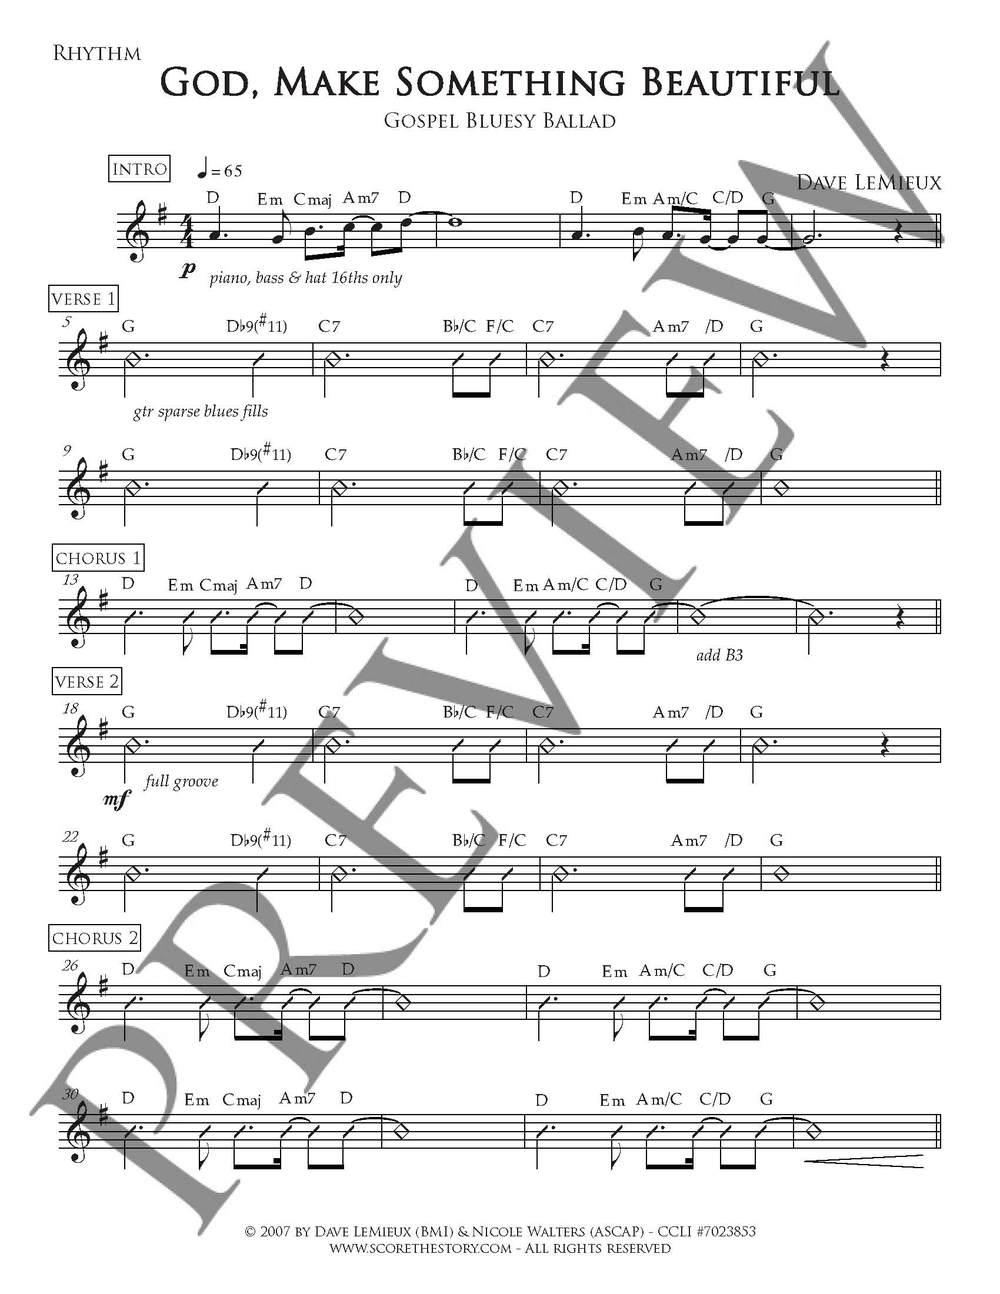 Rhythm Chart preview